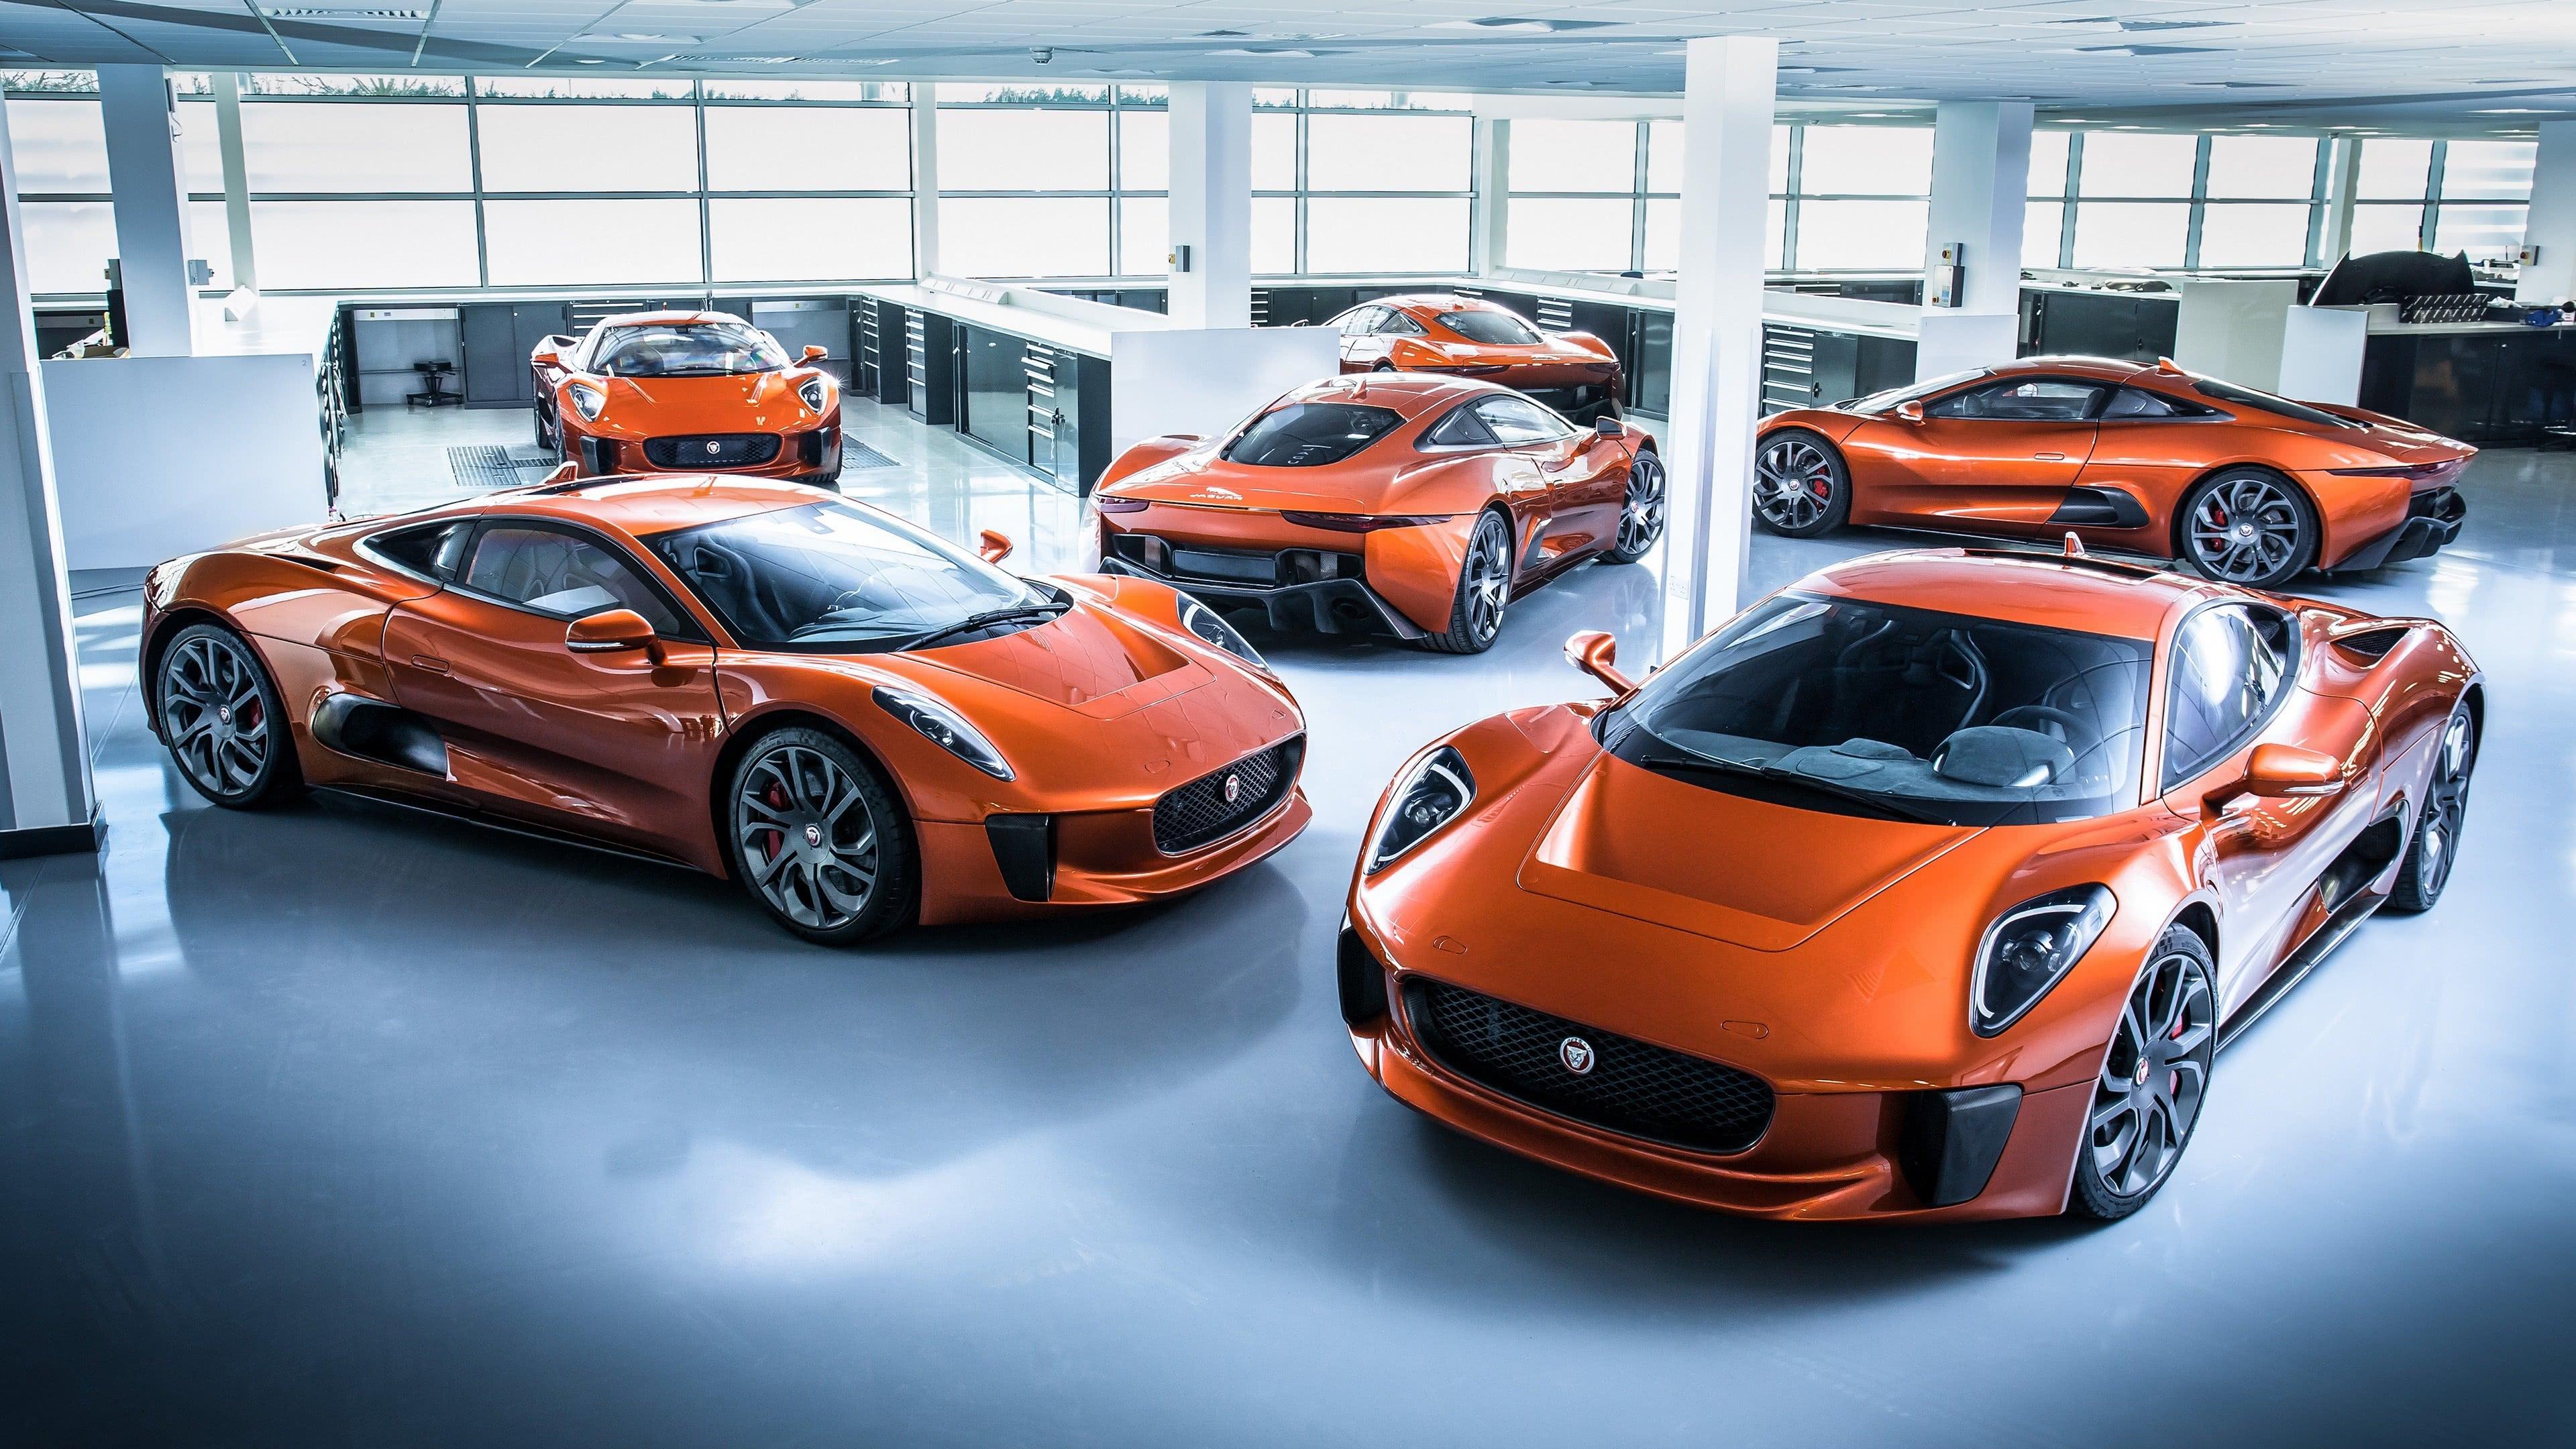 jaguar james bond villain car uhd 4k wallpaper